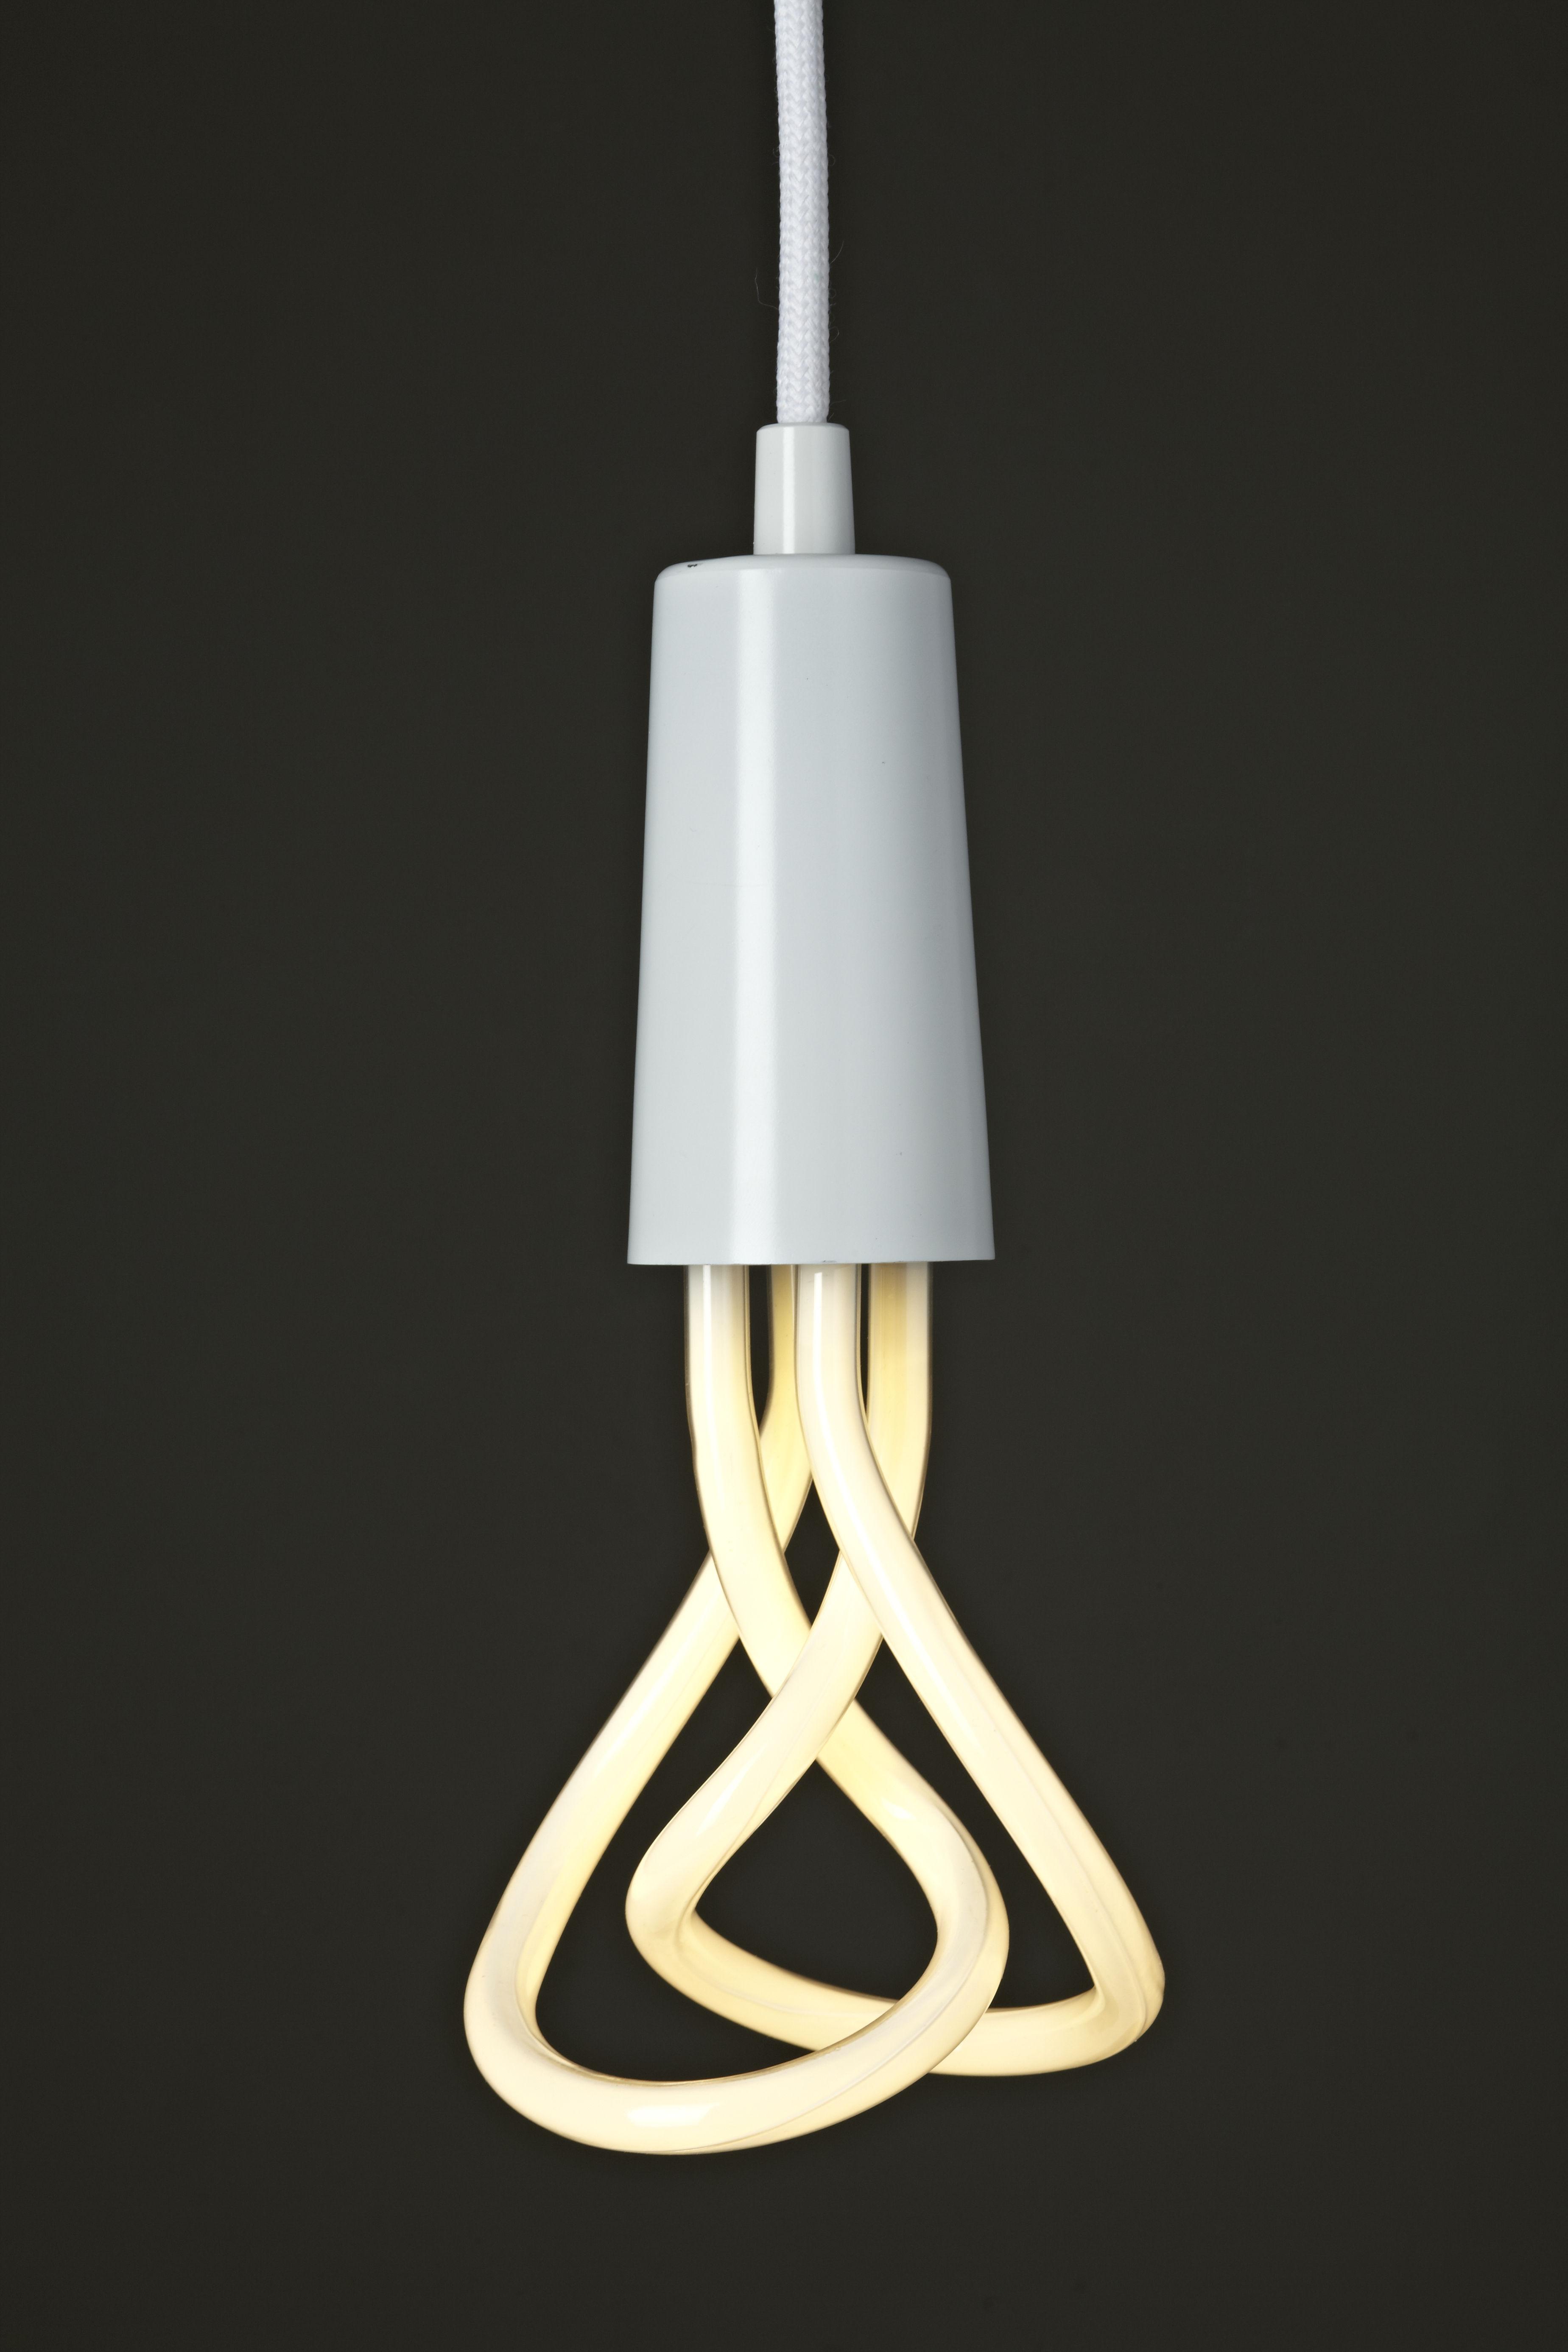 pendant white by plumen. Black Bedroom Furniture Sets. Home Design Ideas